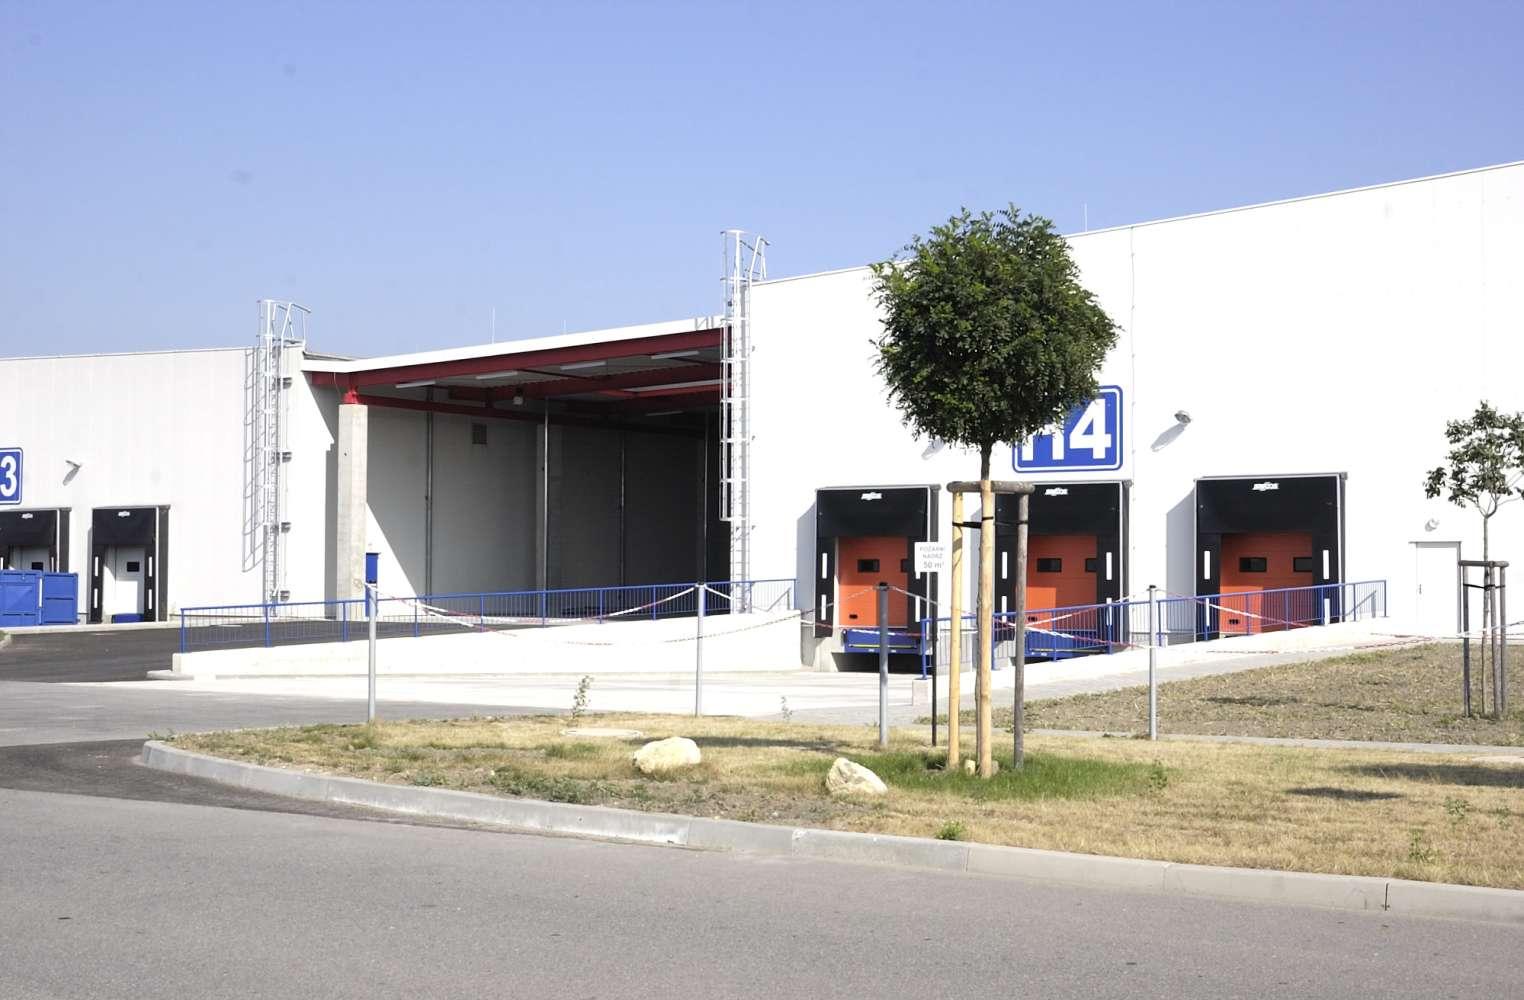 Průmyslové nemovitosti Mlada boleslav - bezdecin,  - UNO Park Mladá Boleslav - Bezděčín - 3